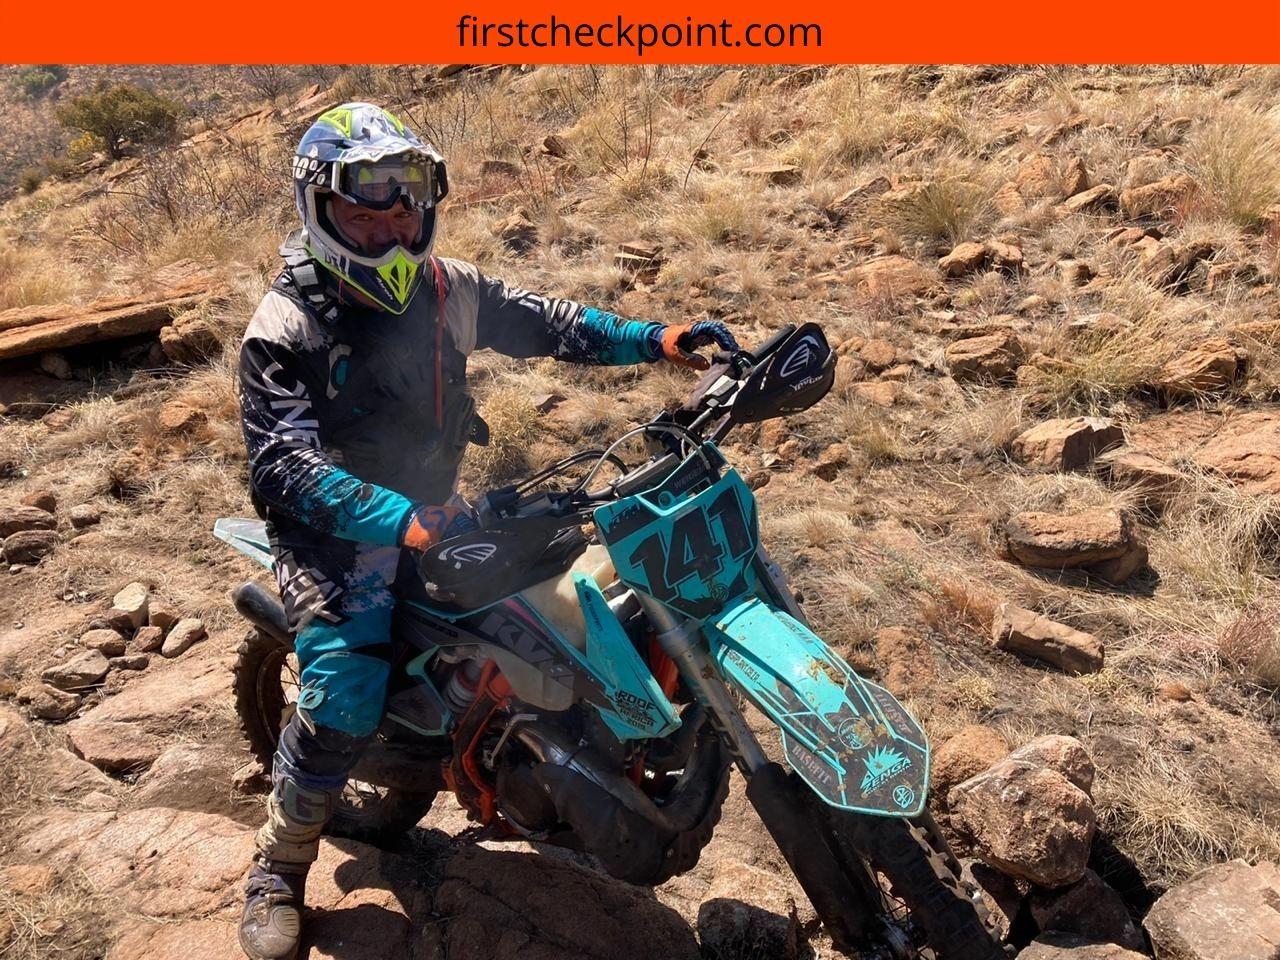 How to dye dirt bike plastics